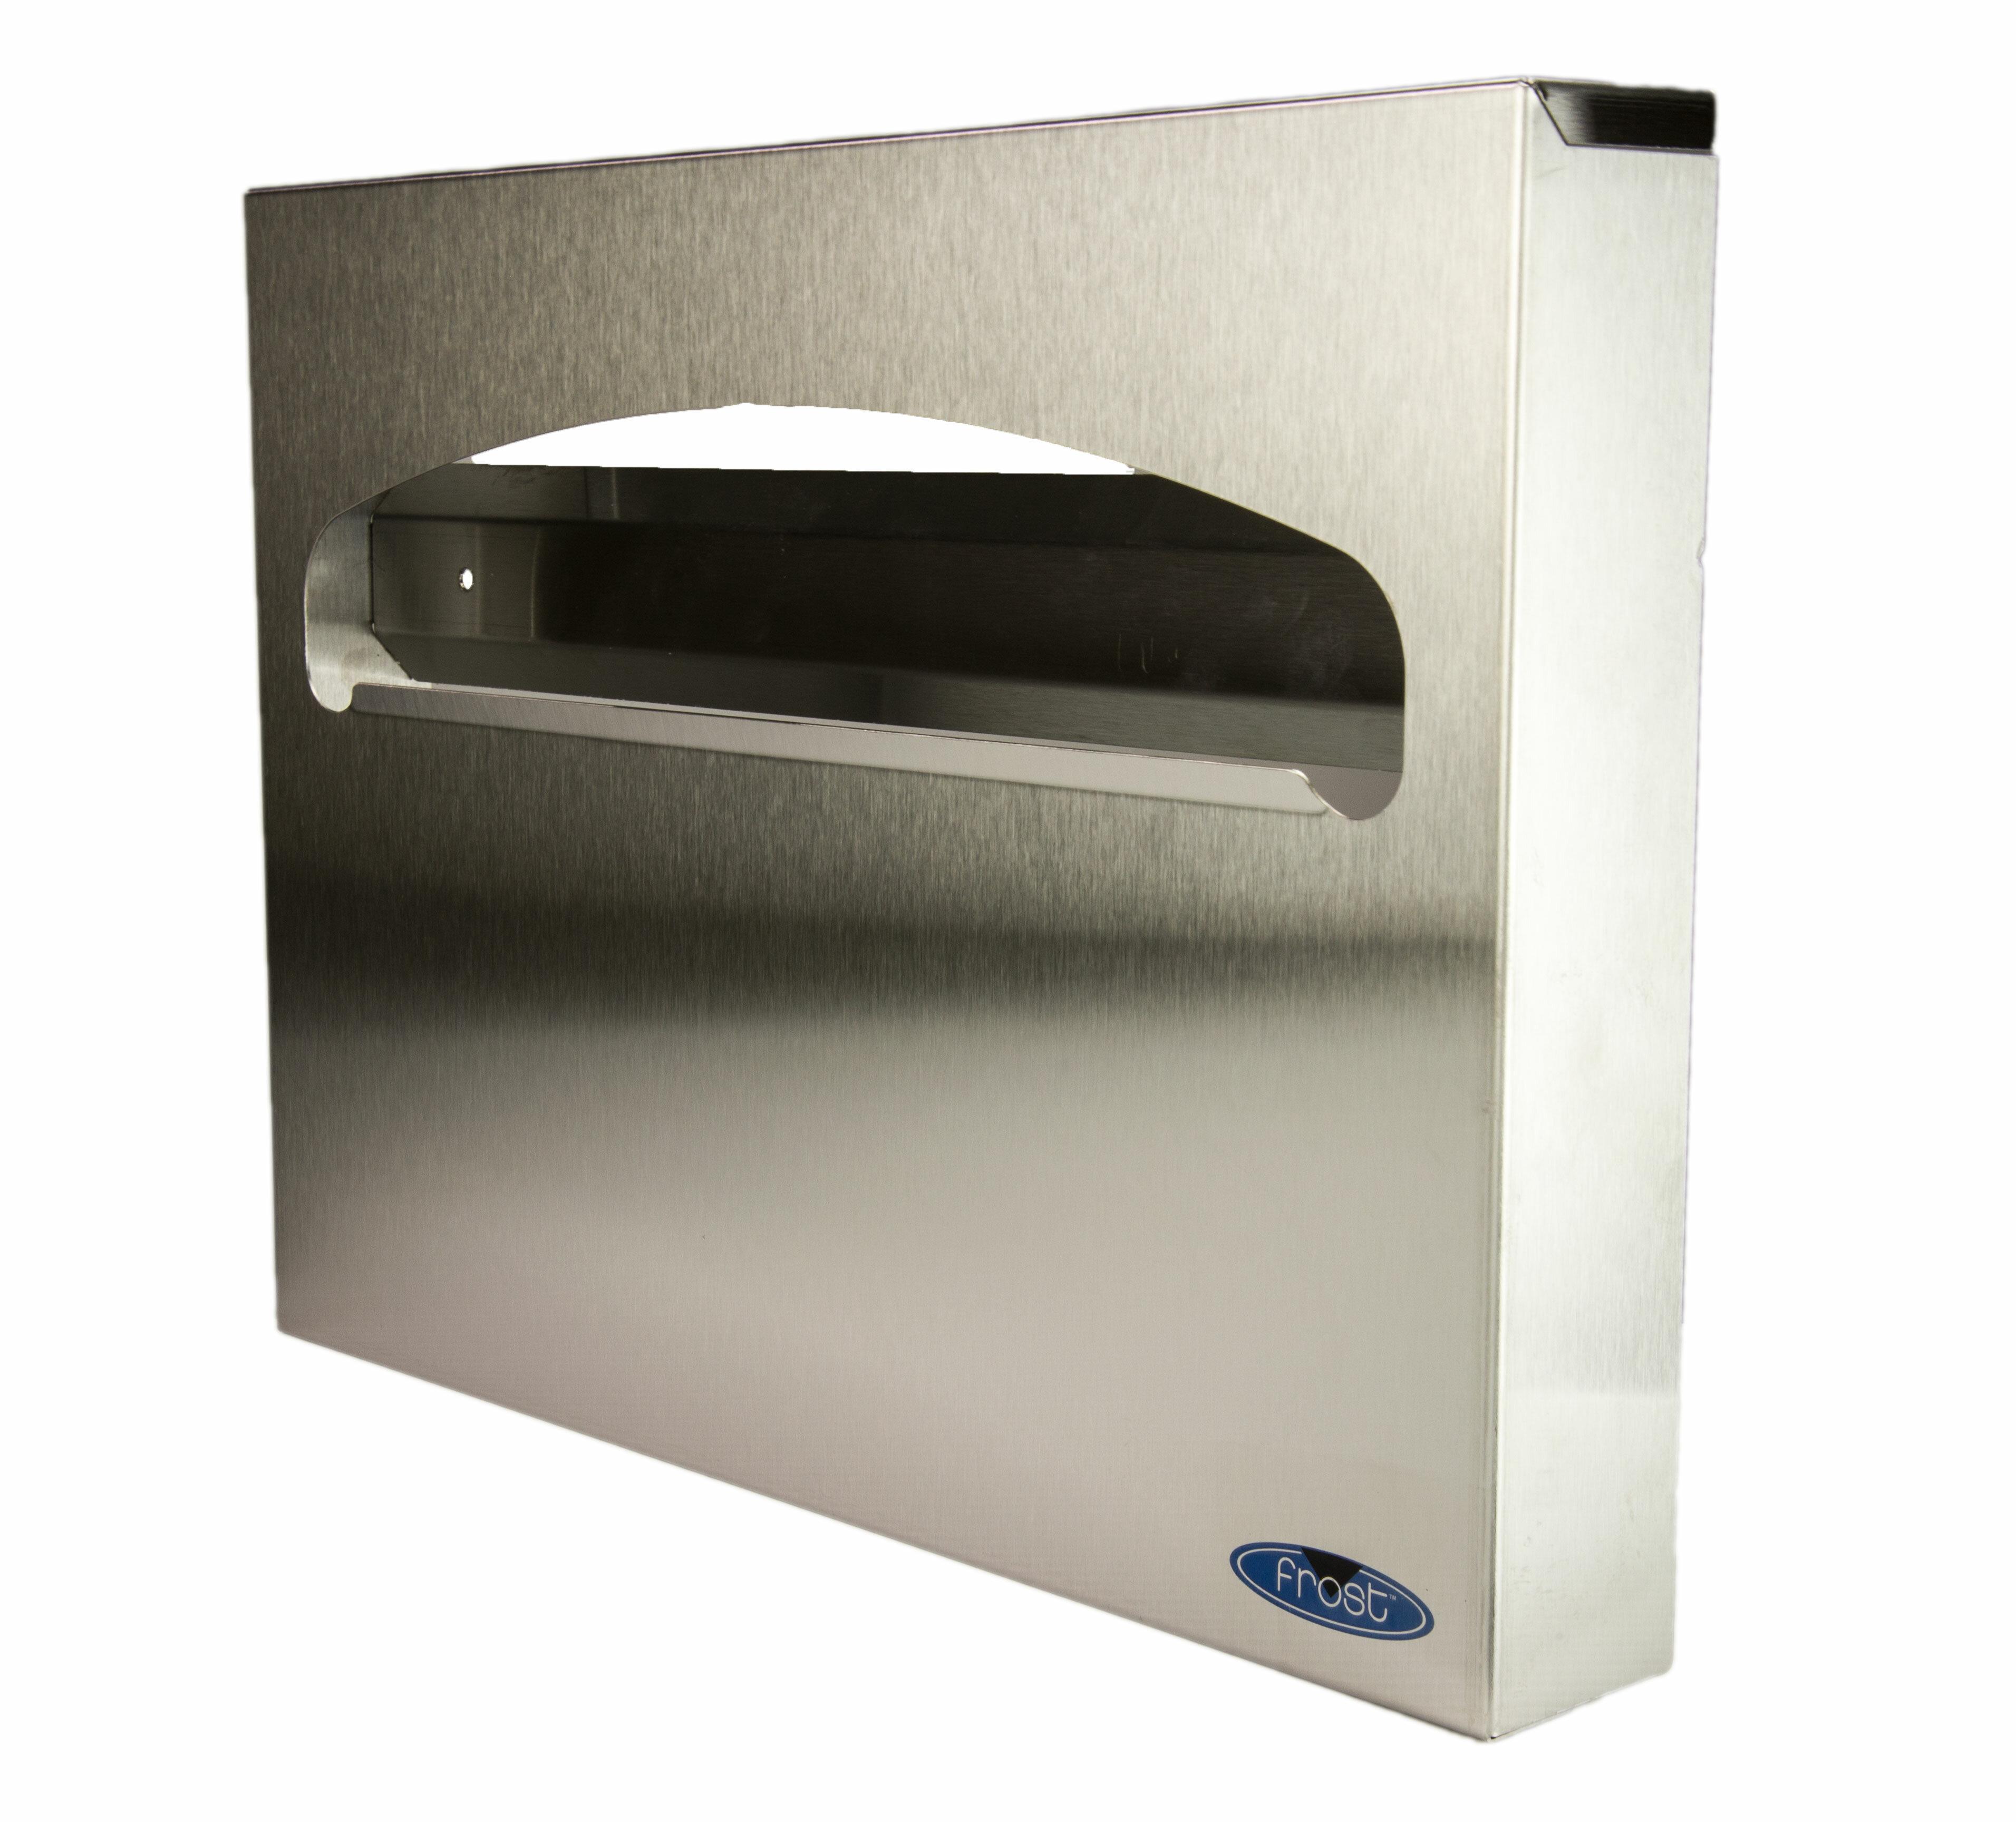 Astonishing Toilet Seat Cover Dispenser Machost Co Dining Chair Design Ideas Machostcouk